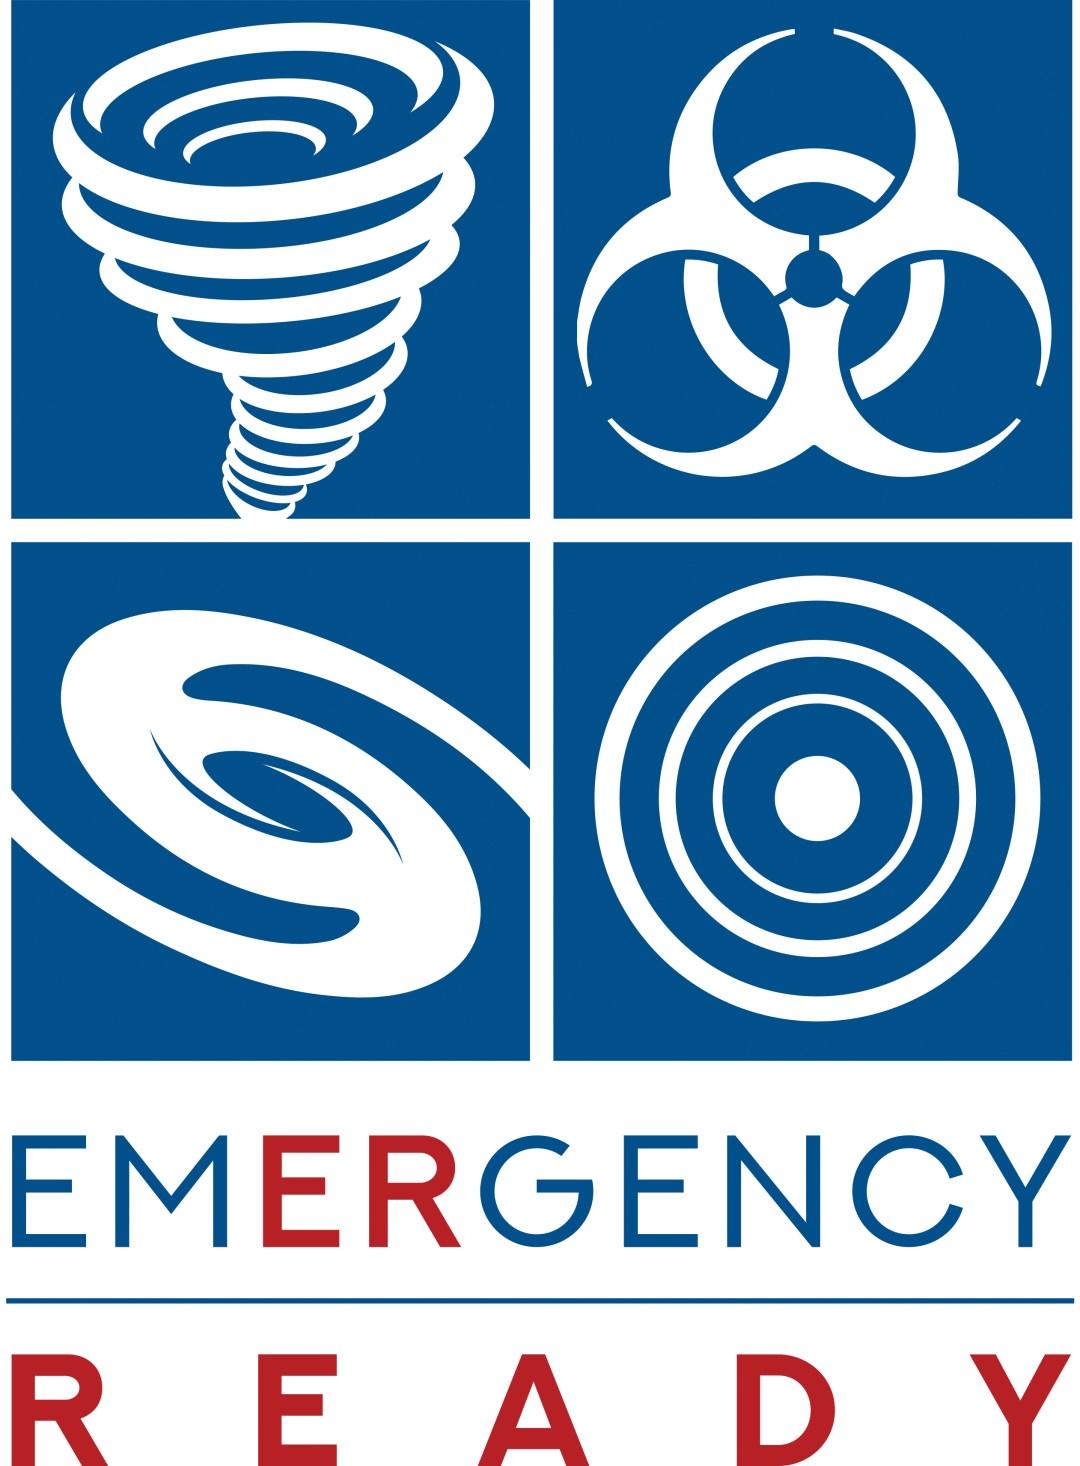 Quake Kare/Emergency Ready